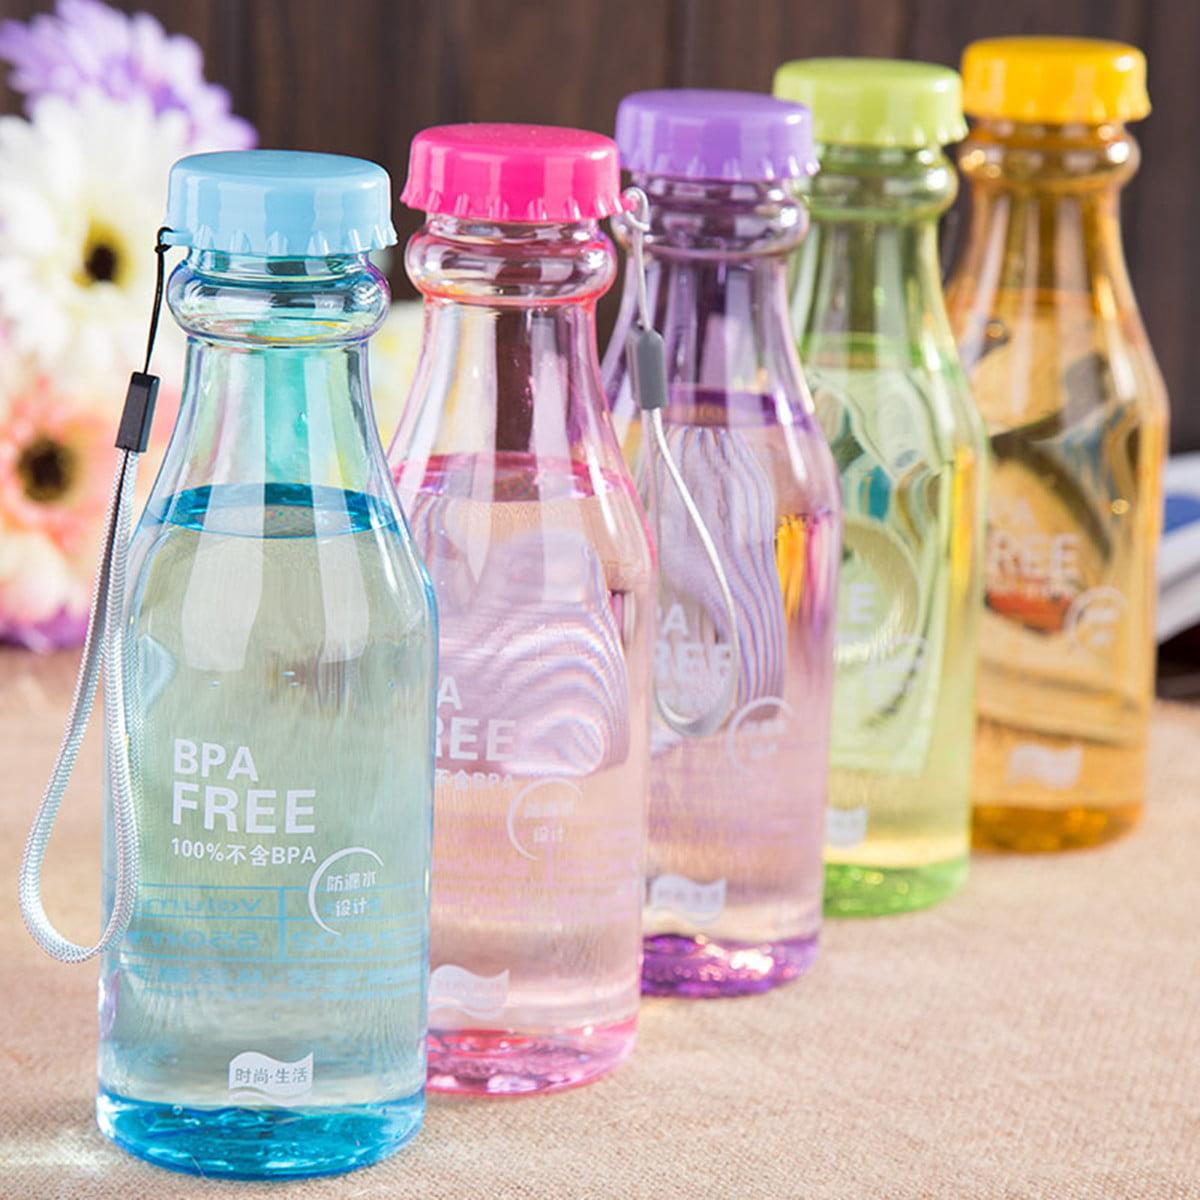 650ml Leak-proof Water Bottle Camping Hiking Bicycle Bike Sports BPA Free Plastic Drink Water Bottle